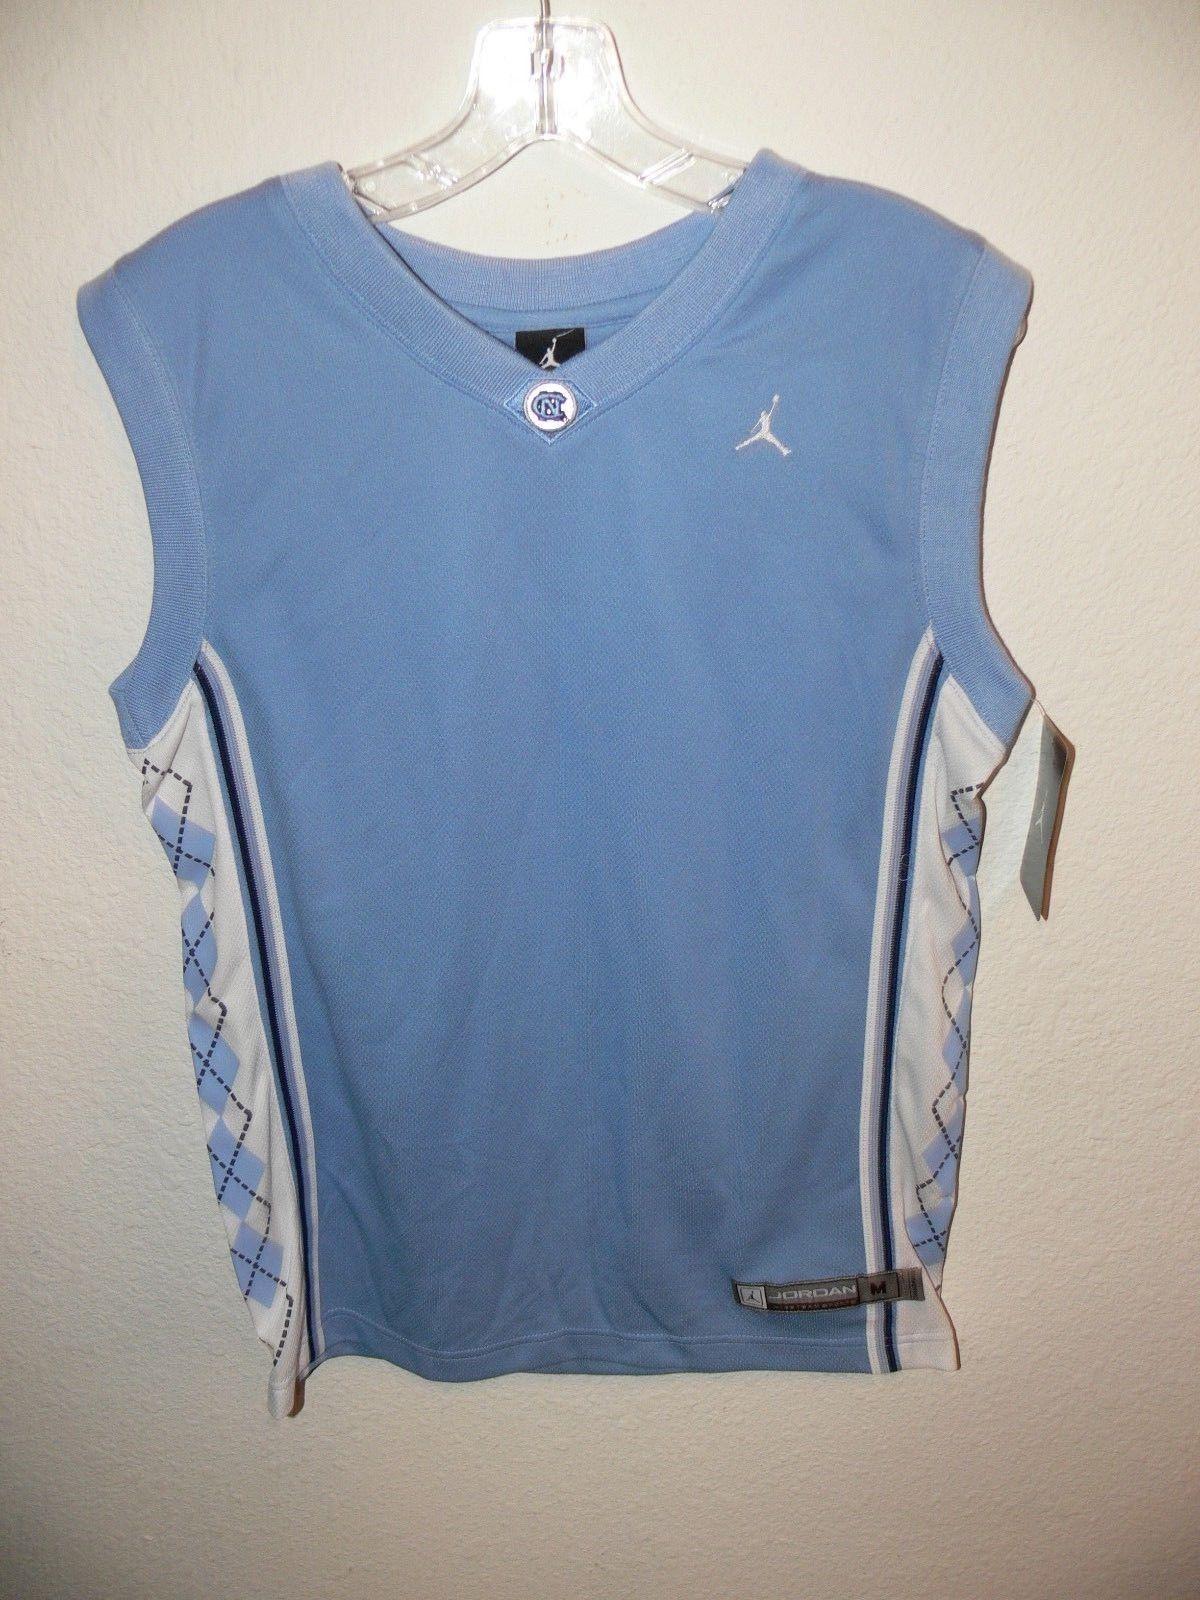 98cd2aac31e878 57. 57. Previous. NORTH CAROLINA Tar Heels NIKE Air Jordan Basketball Jersey  Shirt Mens Size Small